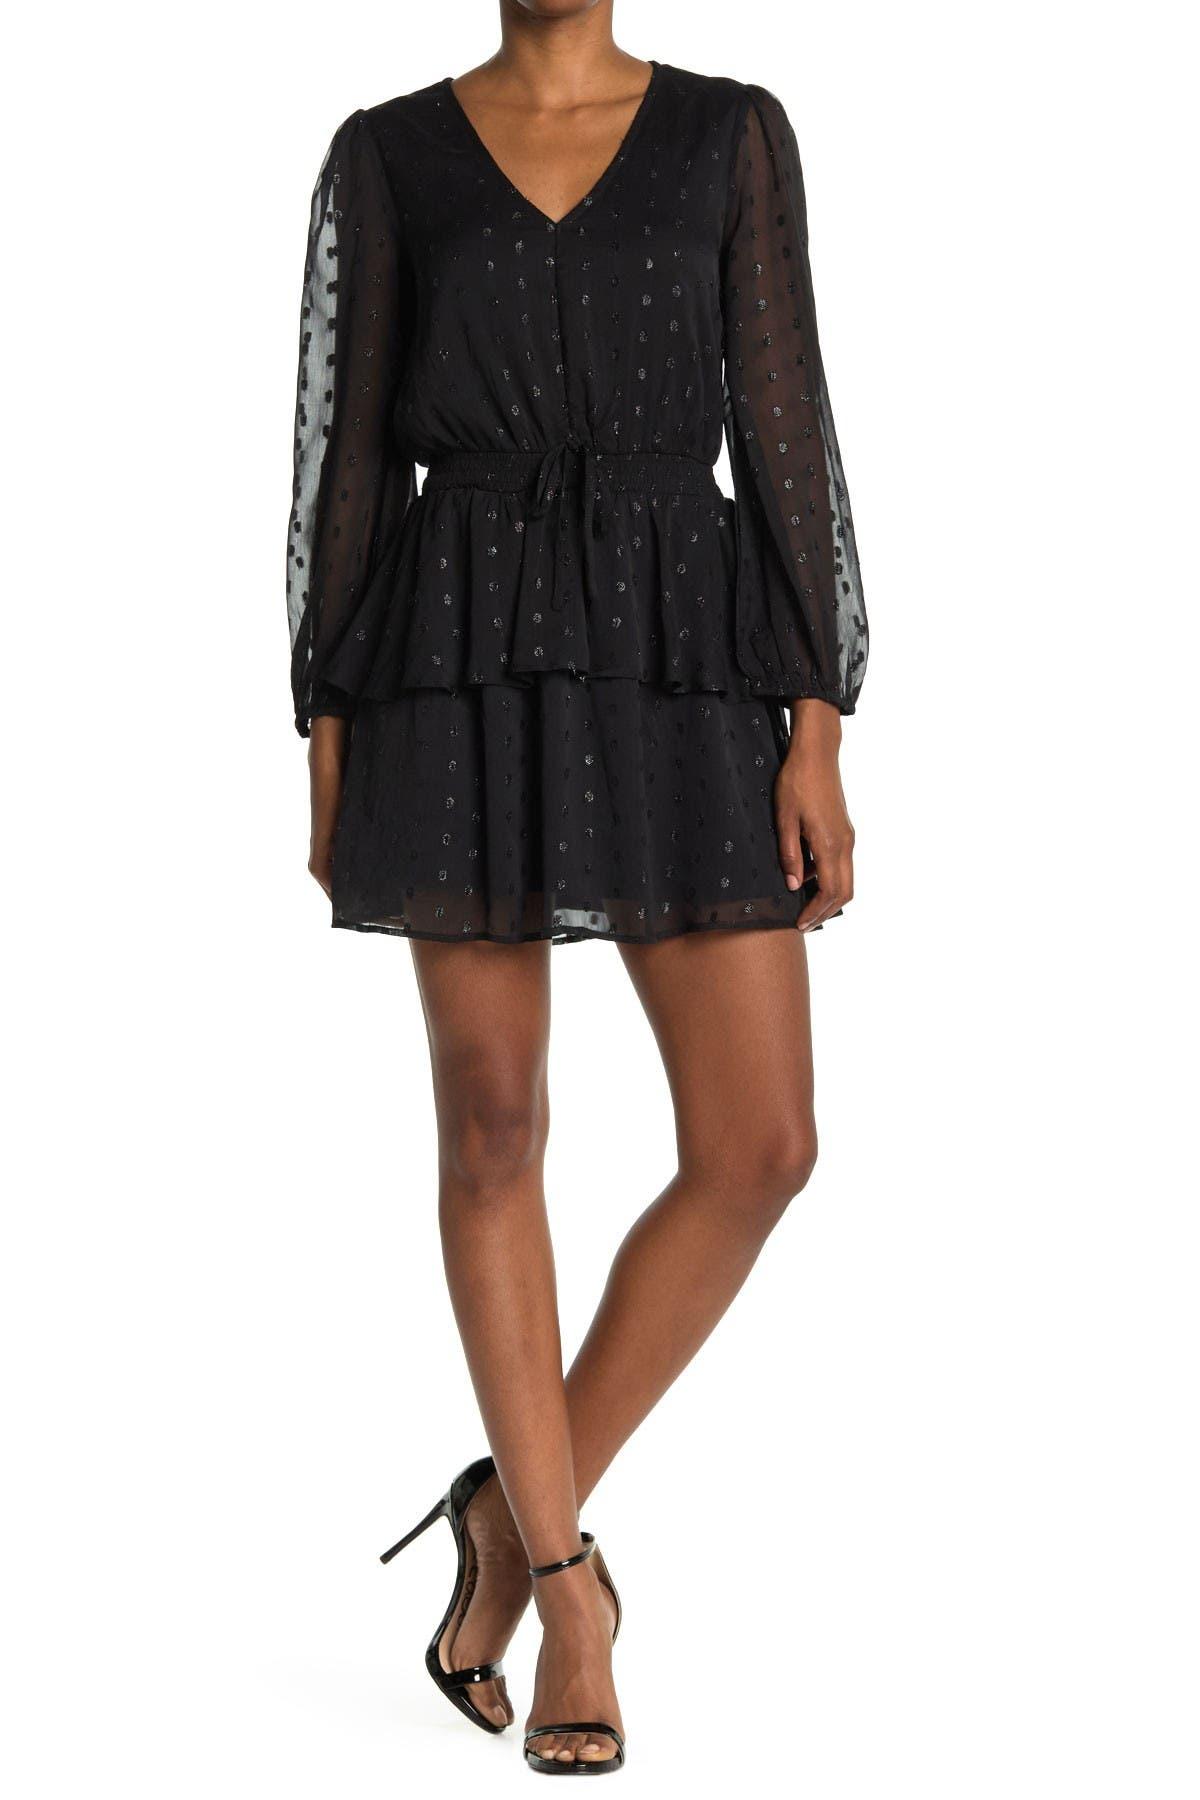 Image of NSR Tyler Metallic Dot Smocked Waist Dress